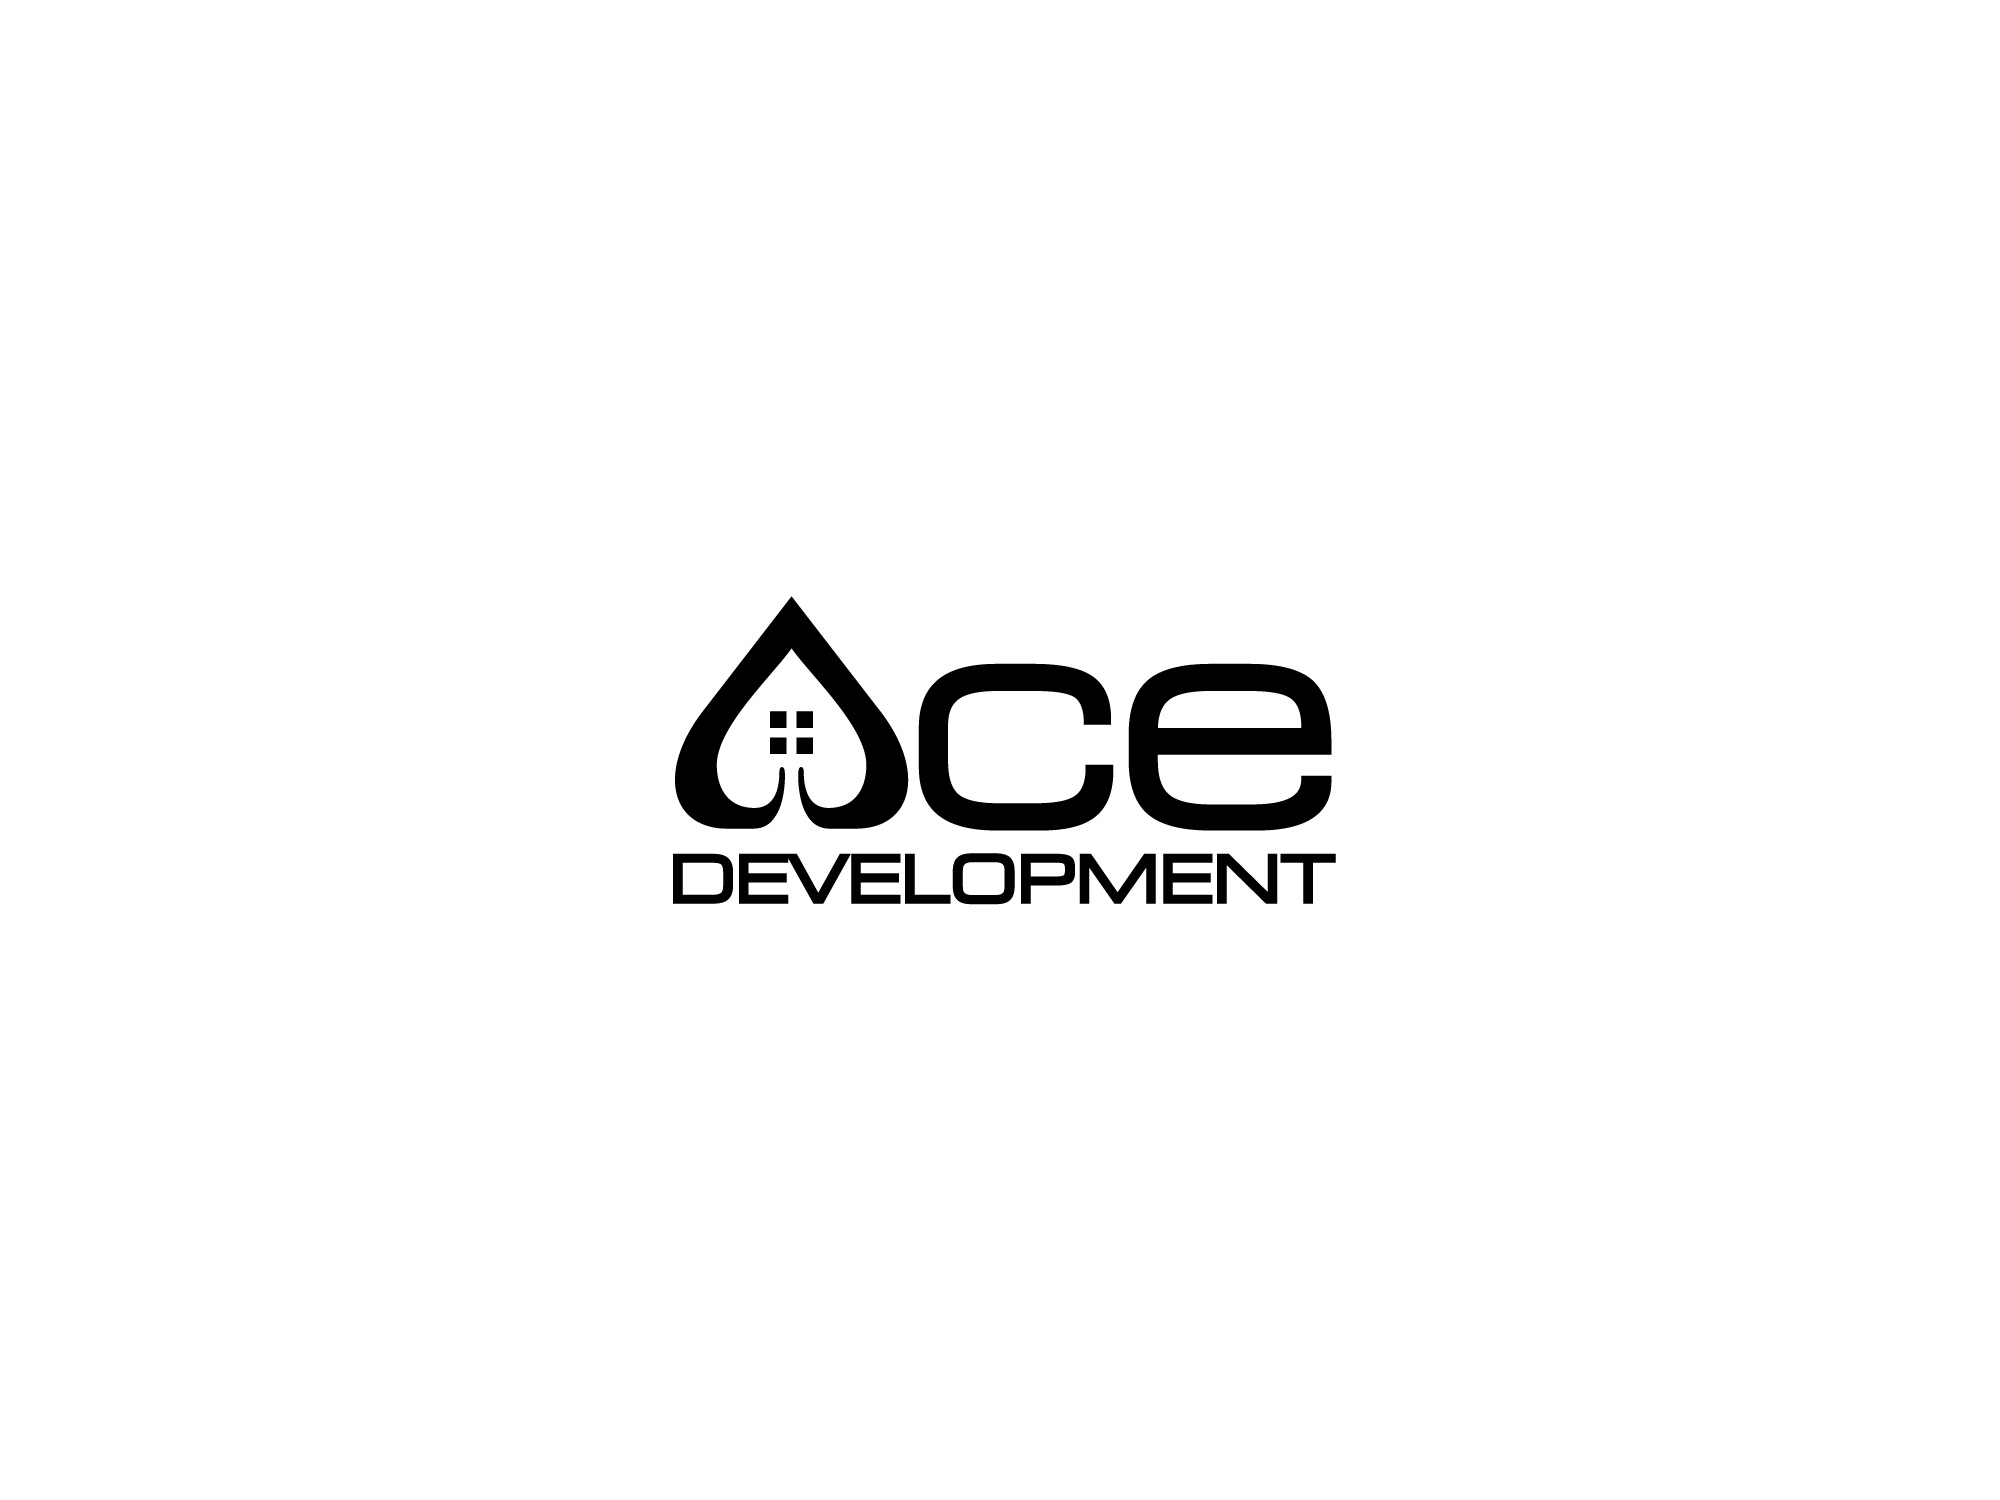 Logo Design by MD SHOHIDUL ISLAM - Entry No. 78 in the Logo Design Contest Fun Logo Design for Ace development.